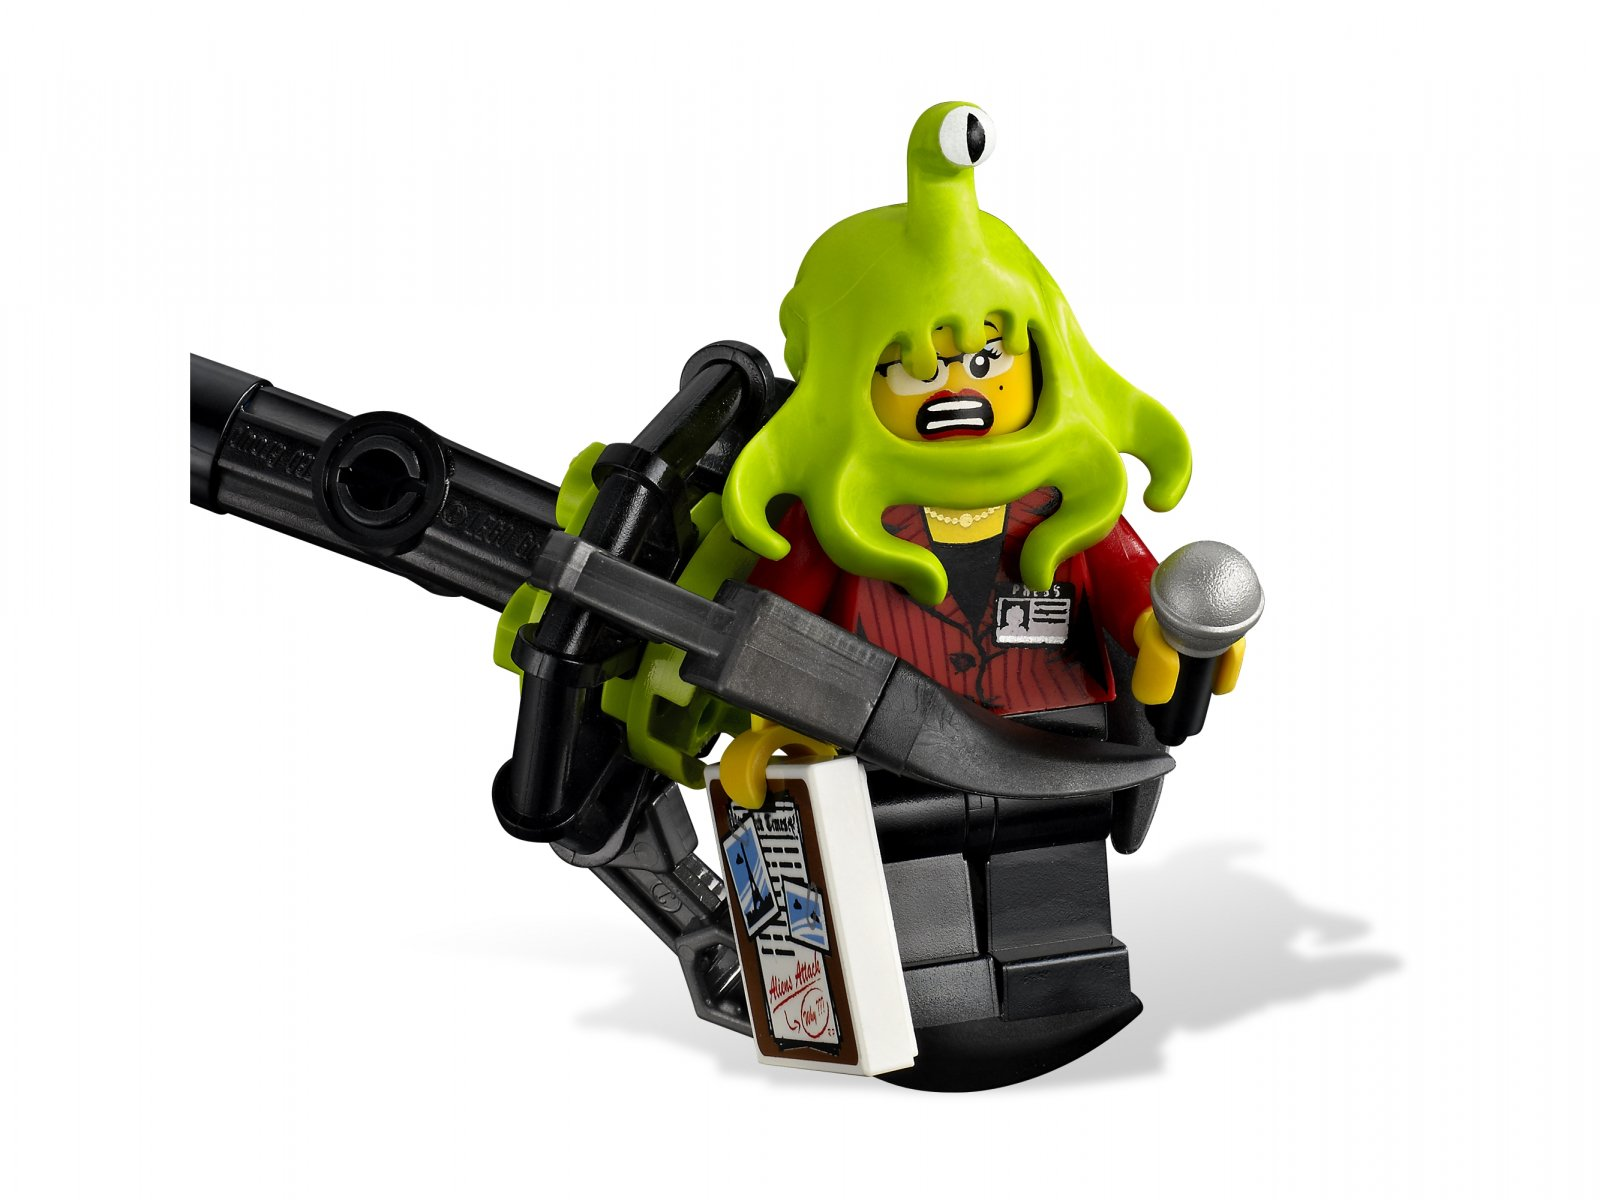 LEGO 7065 Alien Mothership